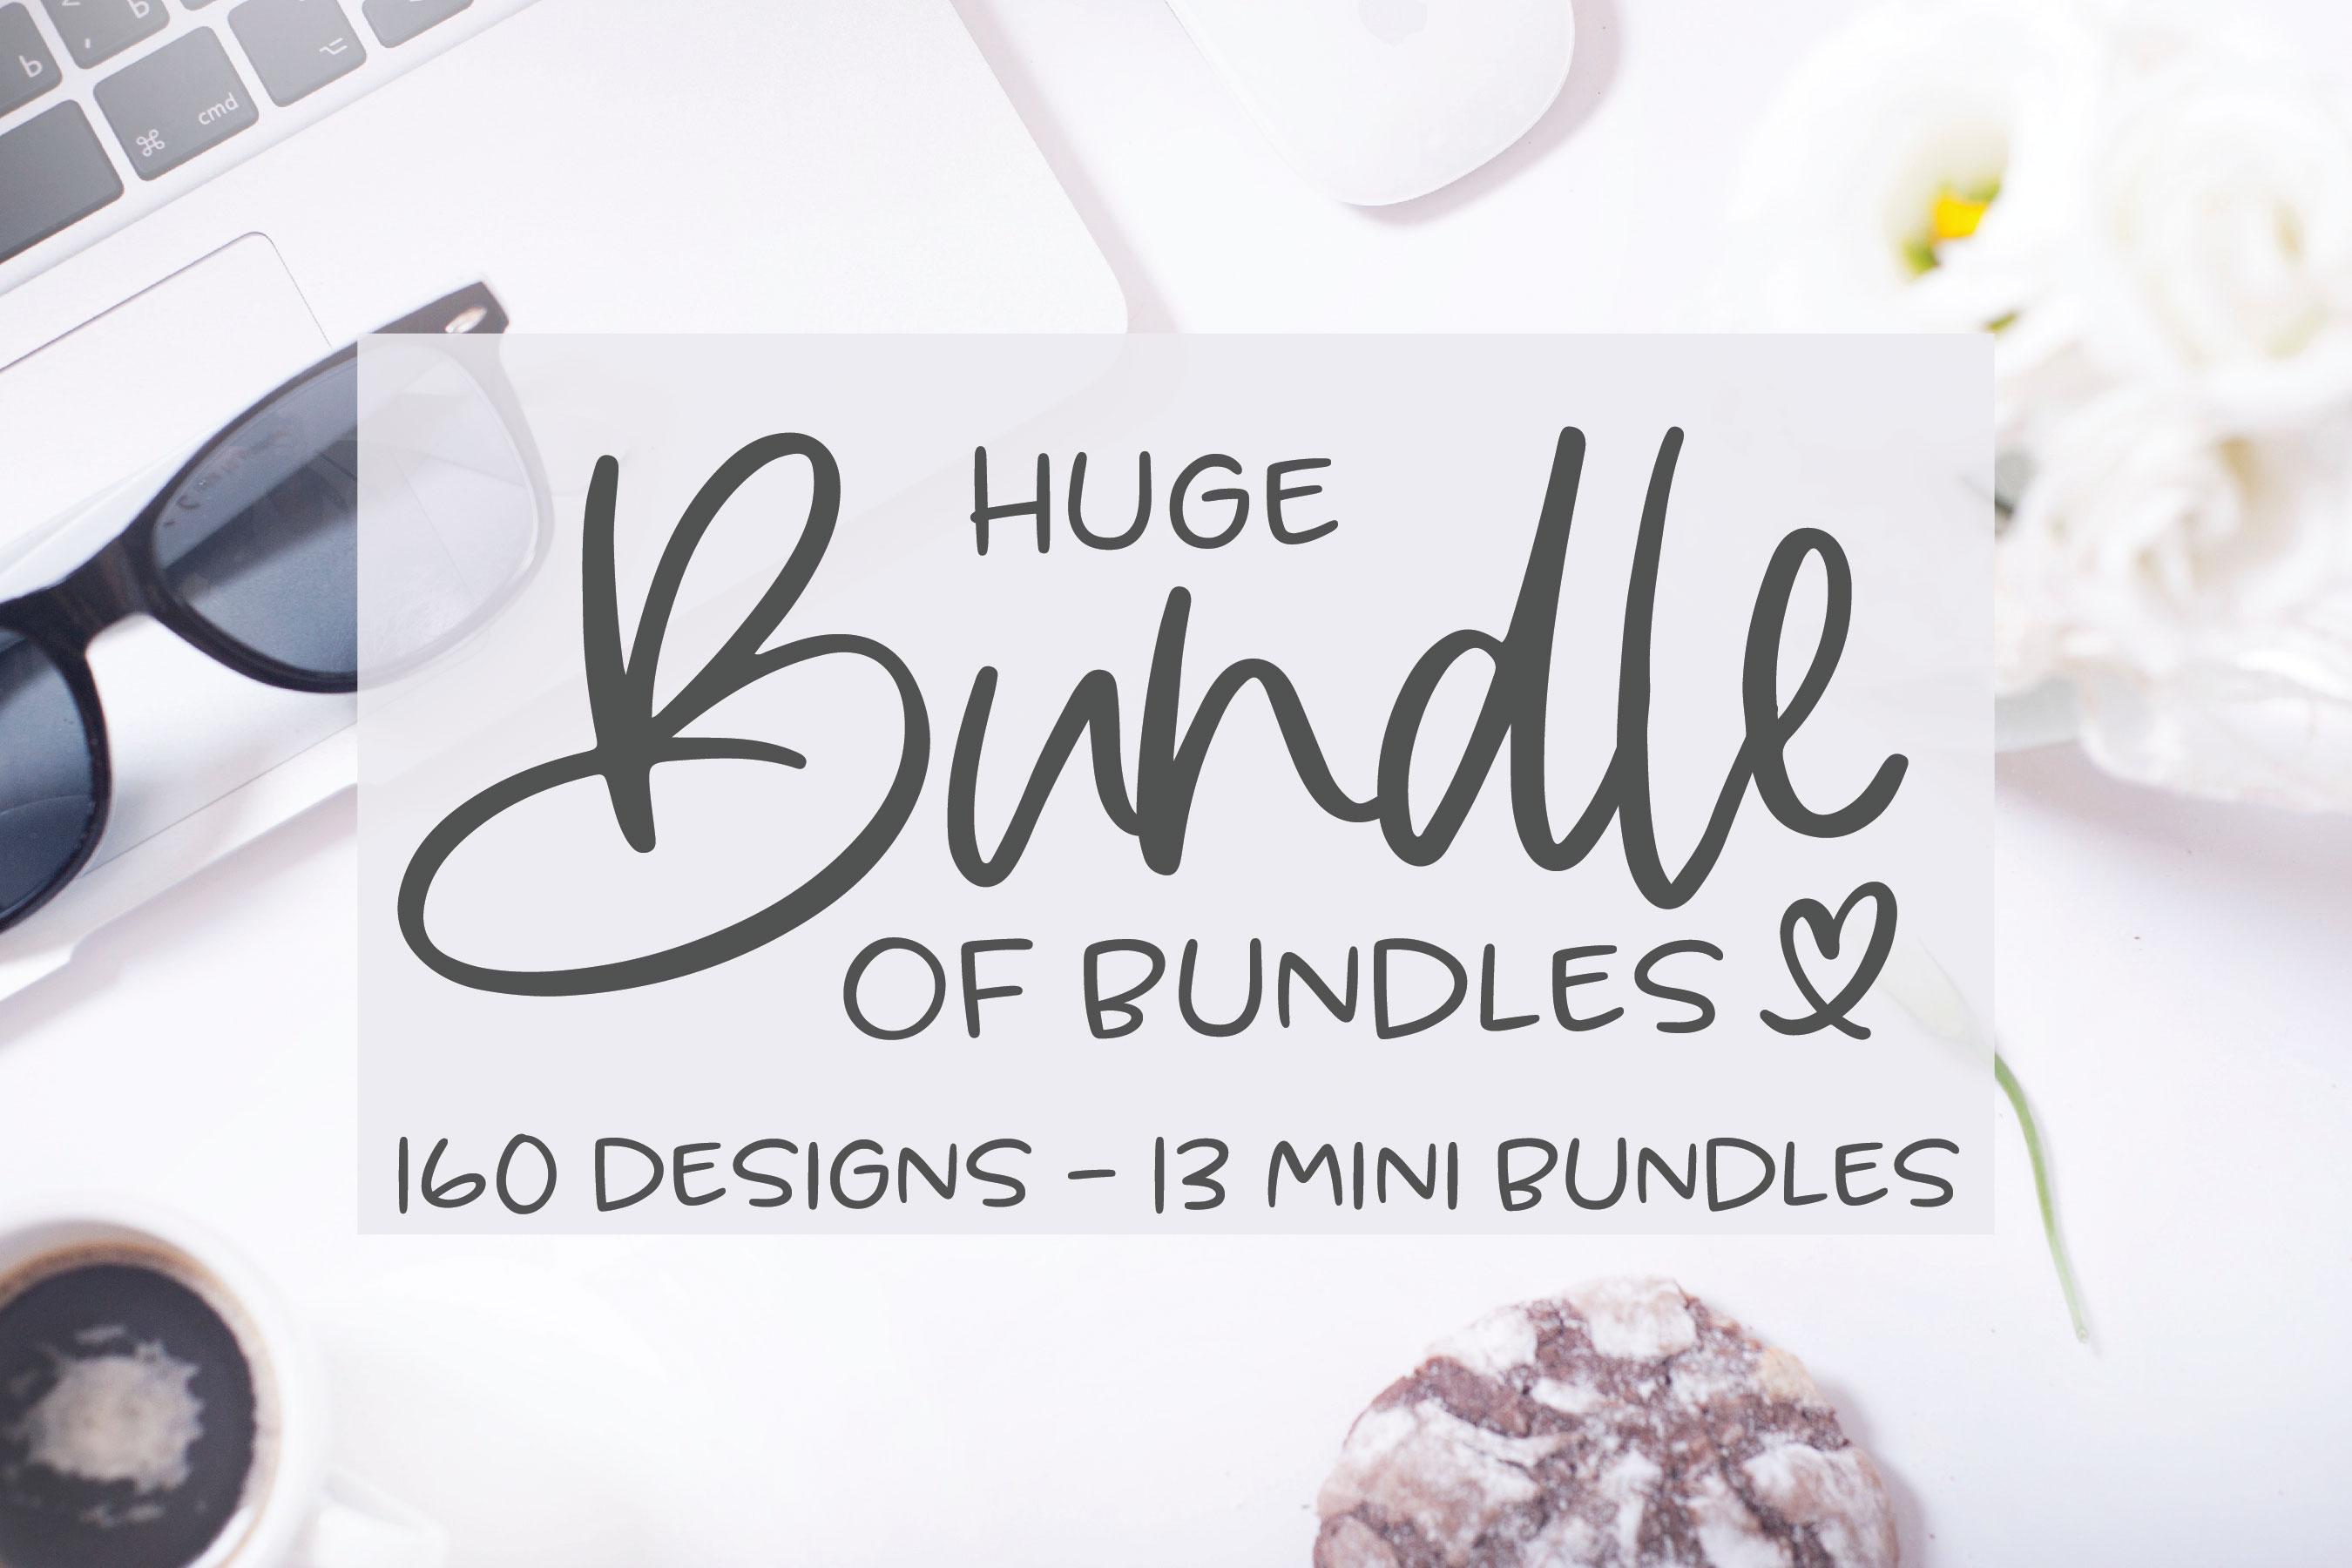 Huge Bundle Of Bundles - 160 SVG Designs - 13 Mini Bundles example image 1